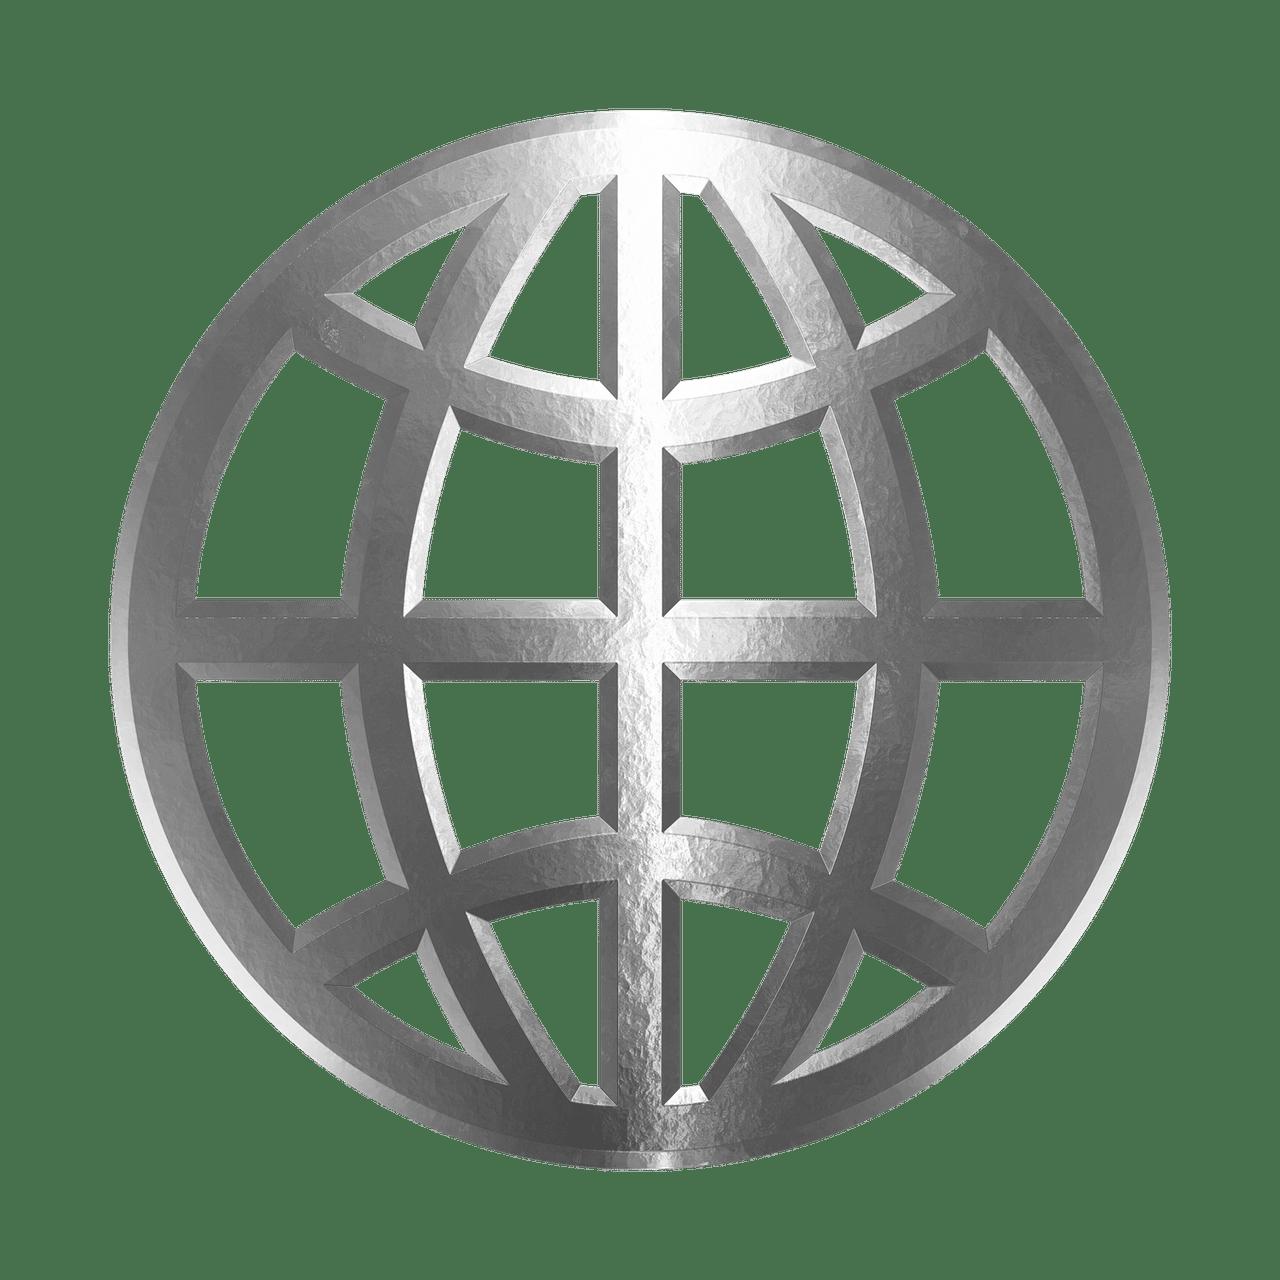 silver net icon